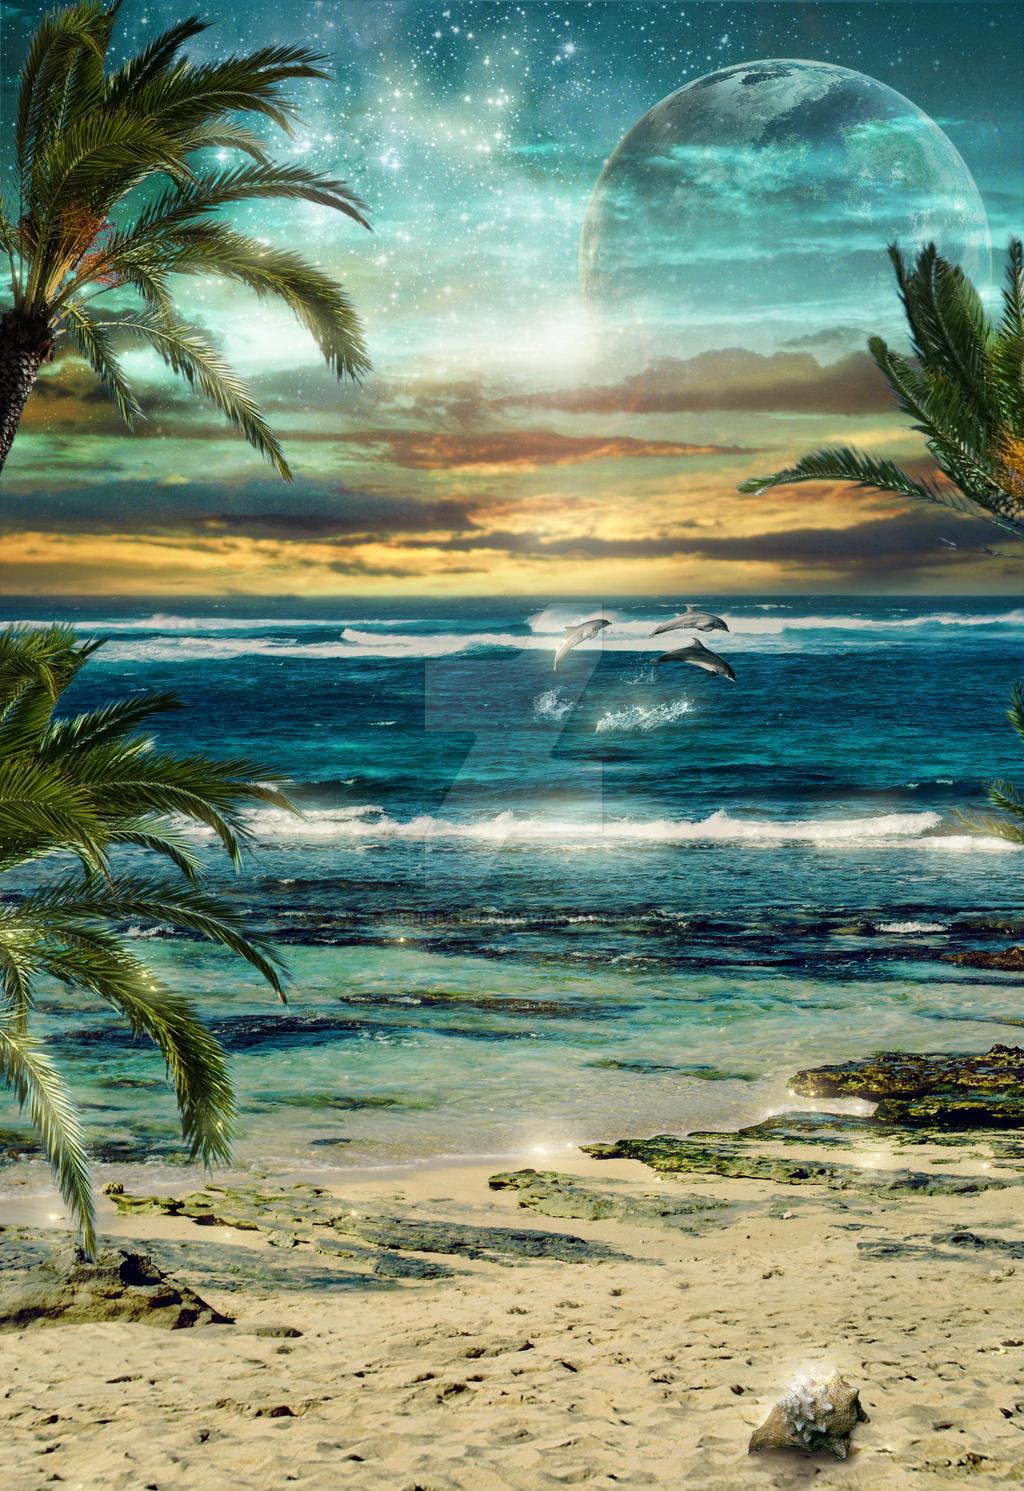 Sea Sunset Fantasy by IgnisFatuusII